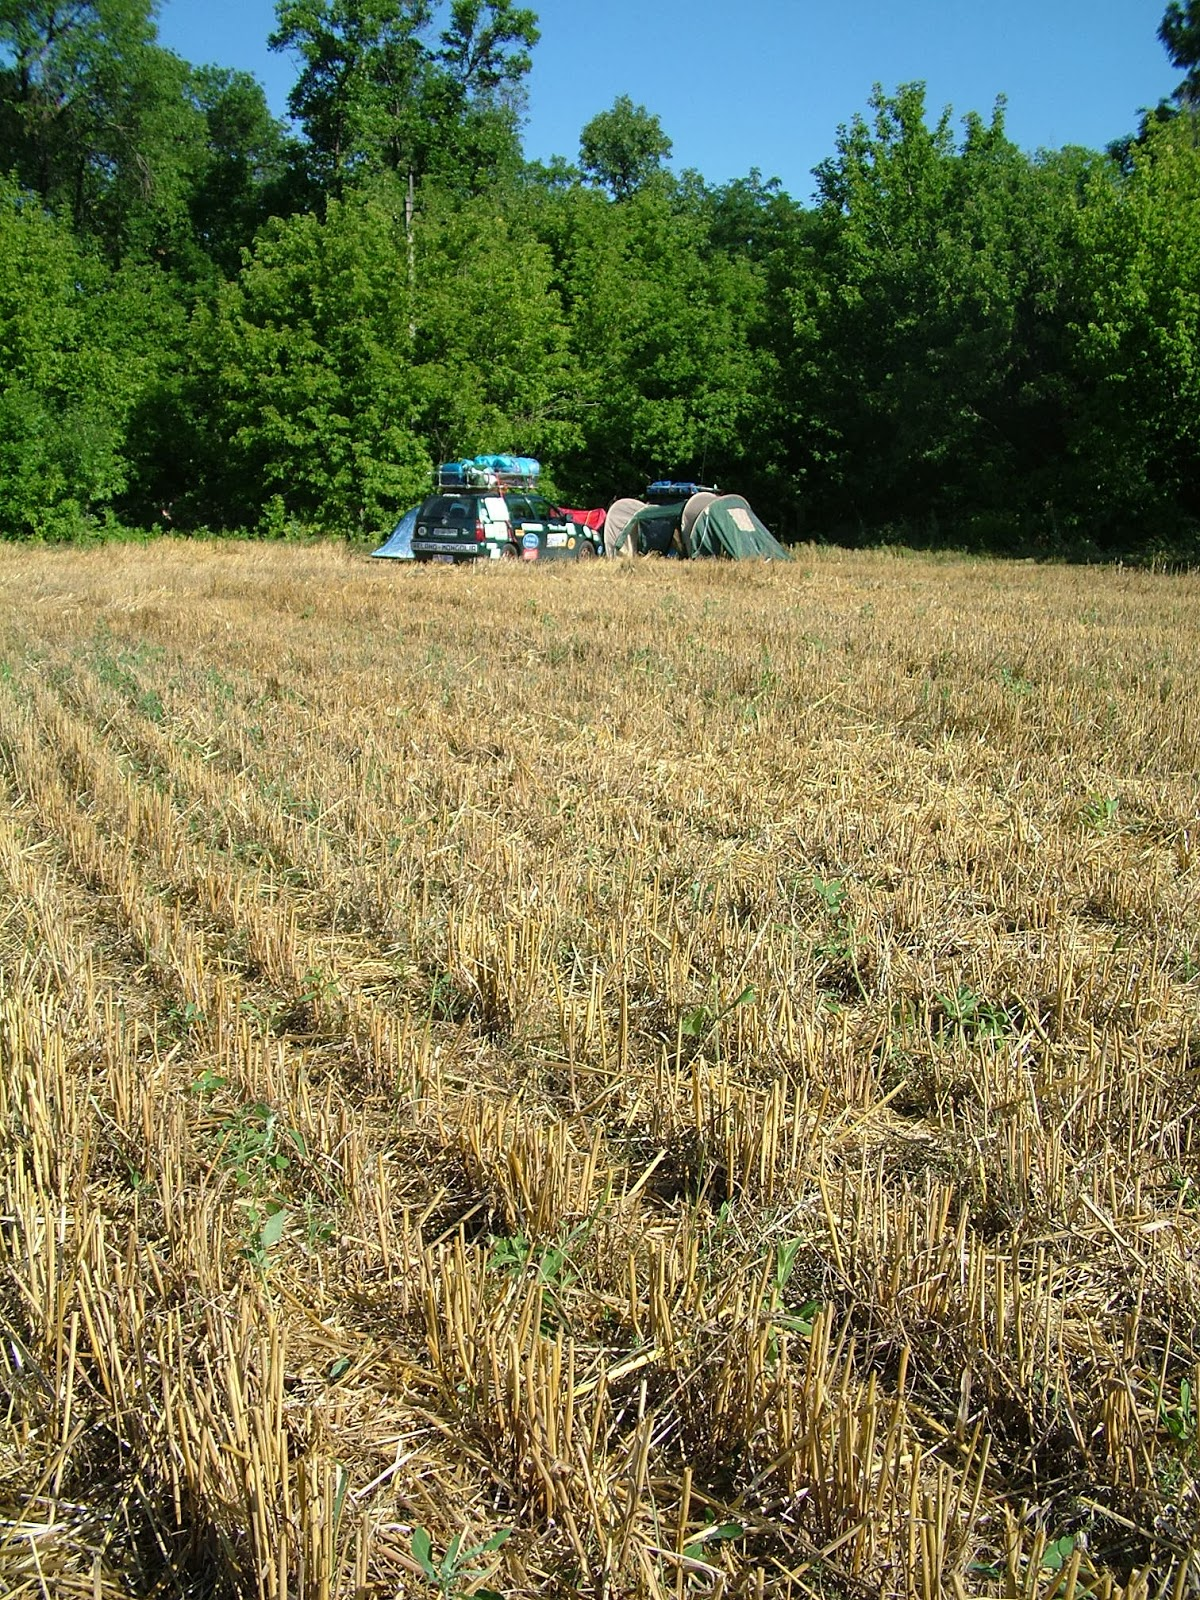 Camping in Ukraine.jpg